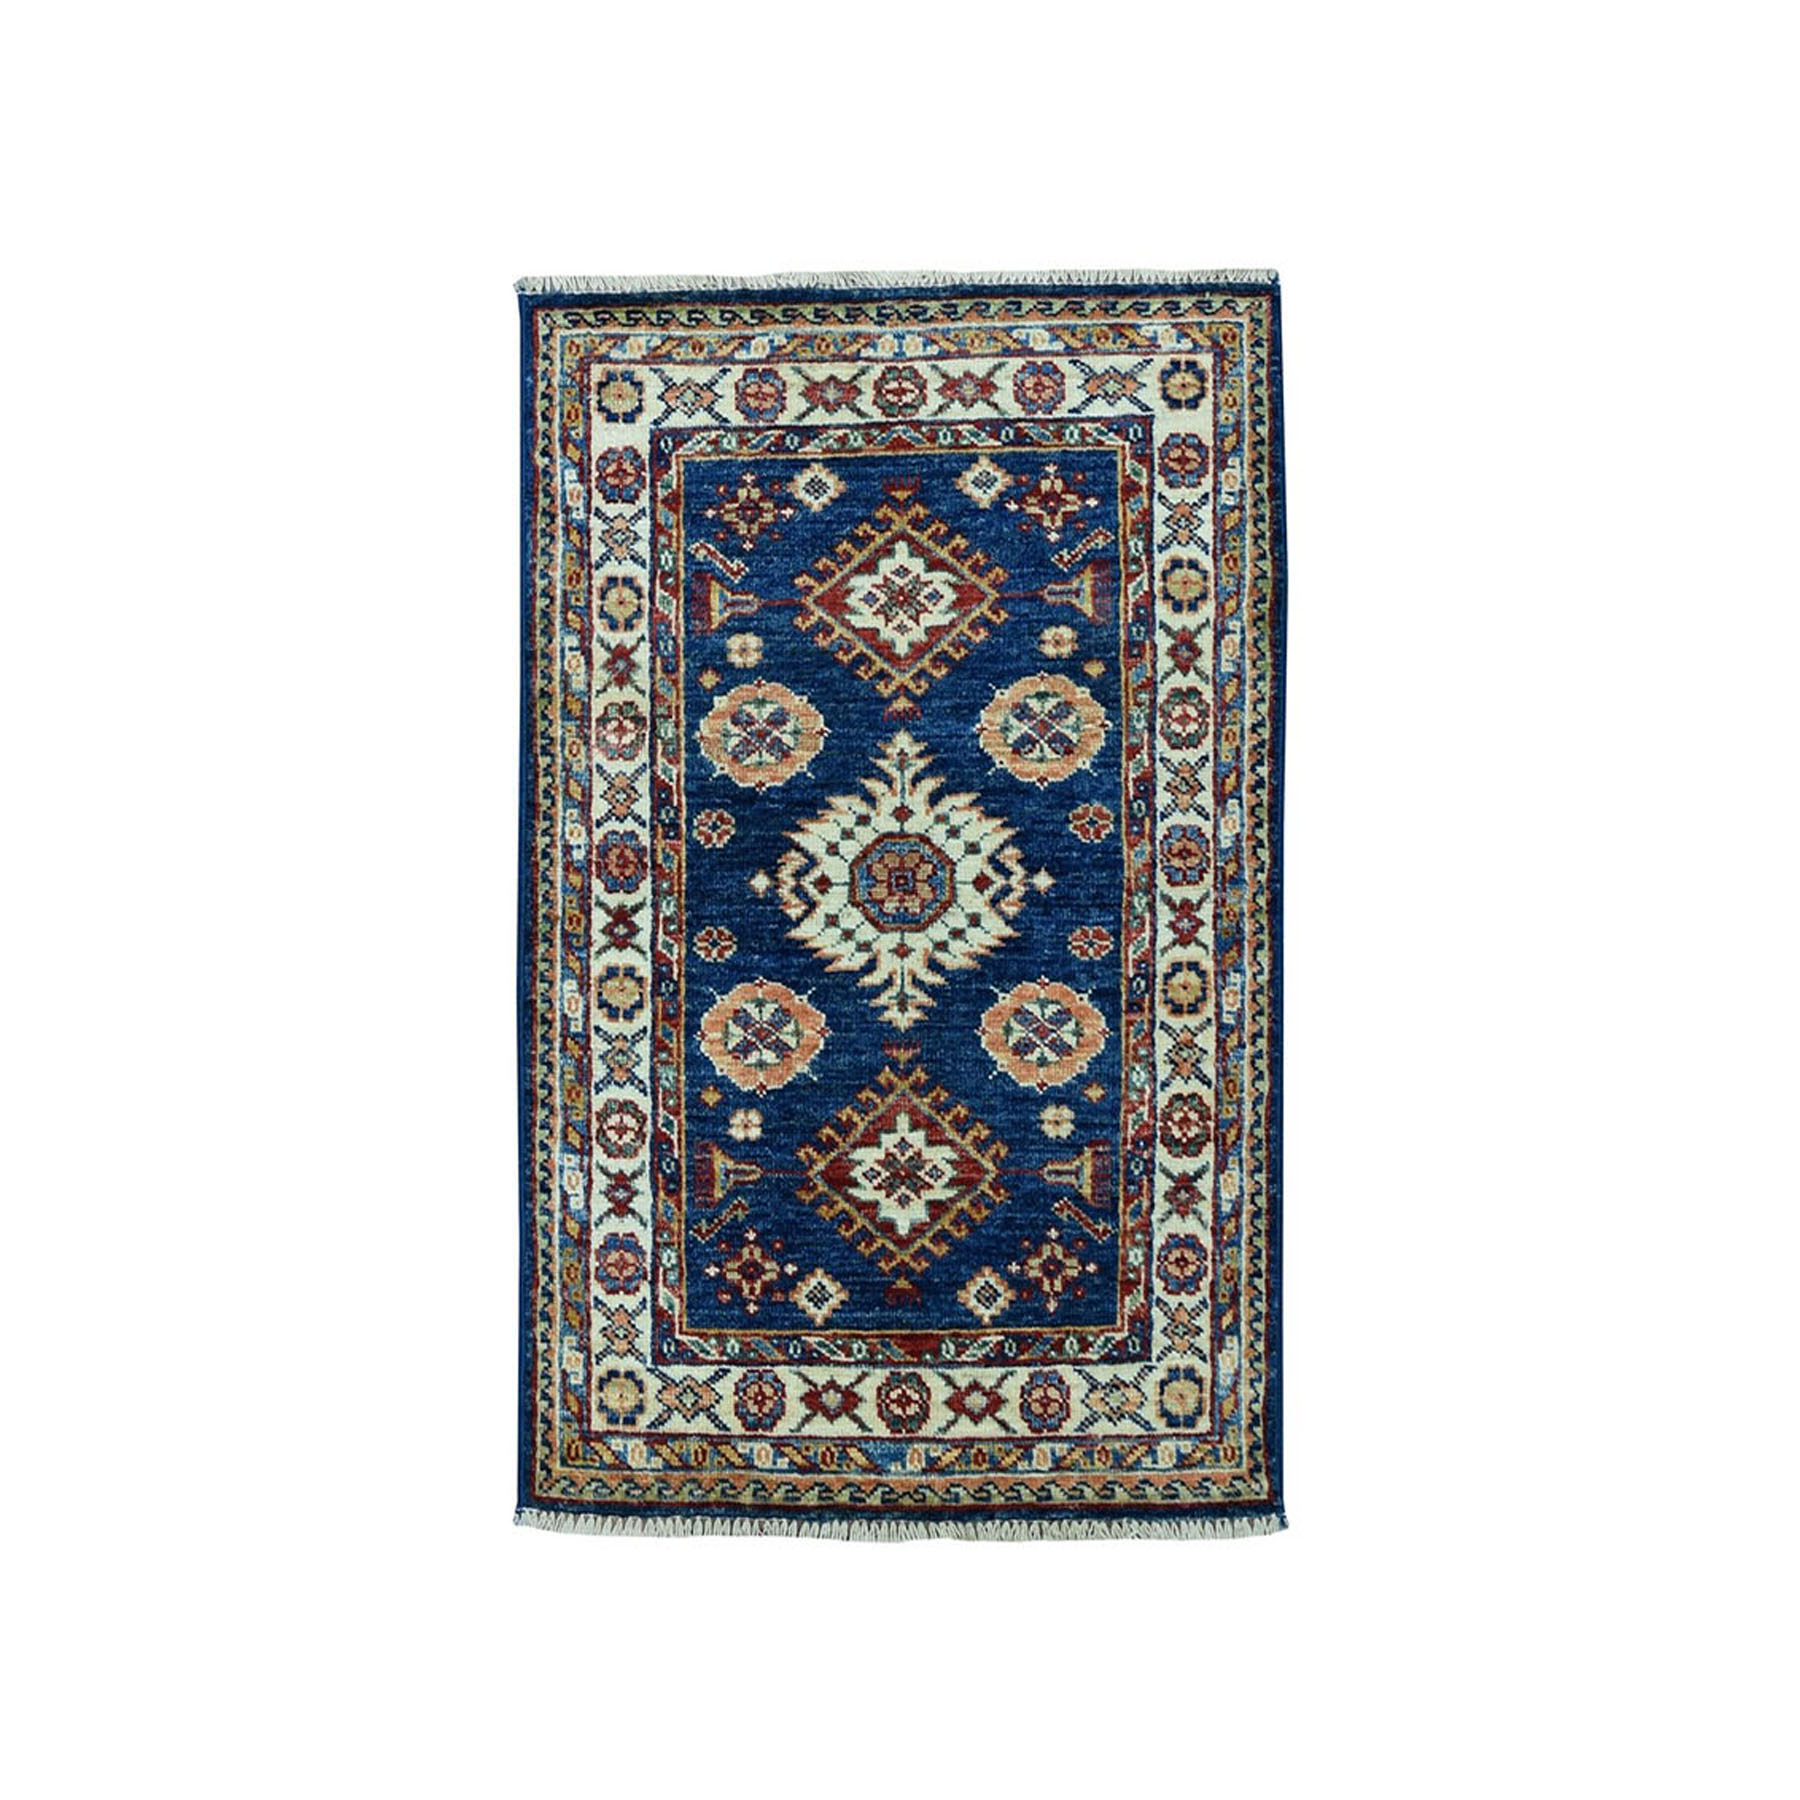 2'X3' Blue Super Kazak Geometric Design Pure Wool Hand-Knotted Oriental Rug moae098e